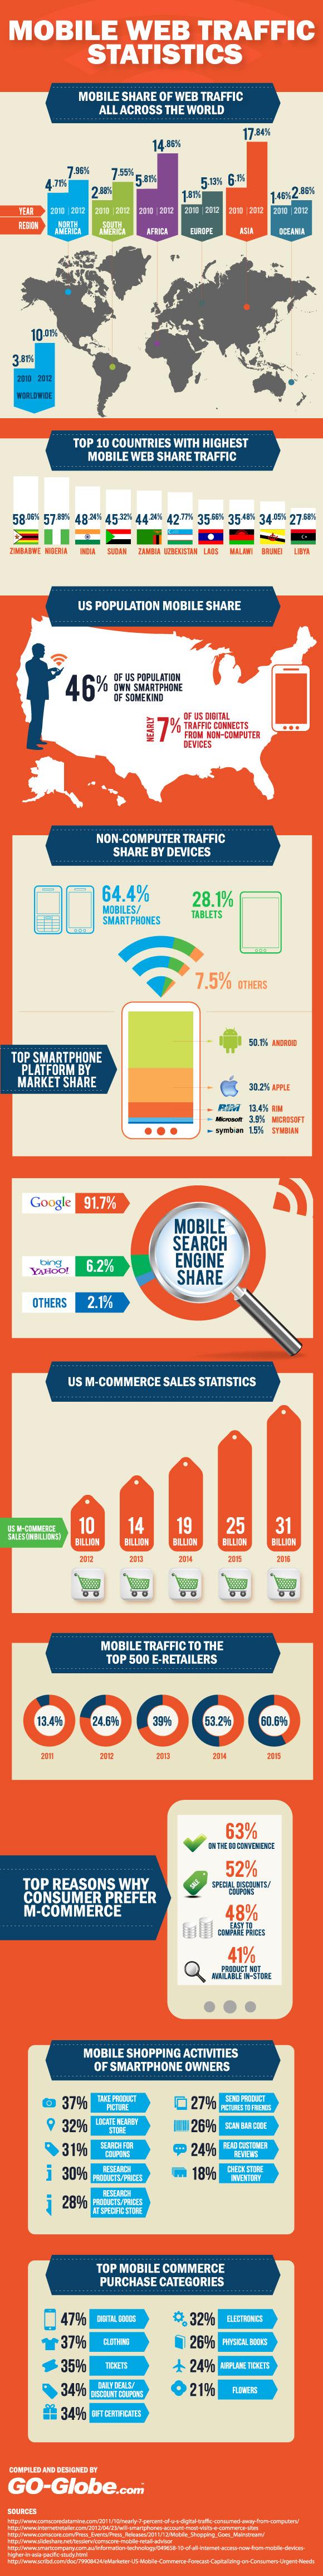 Mobile-web-traffic-statistics